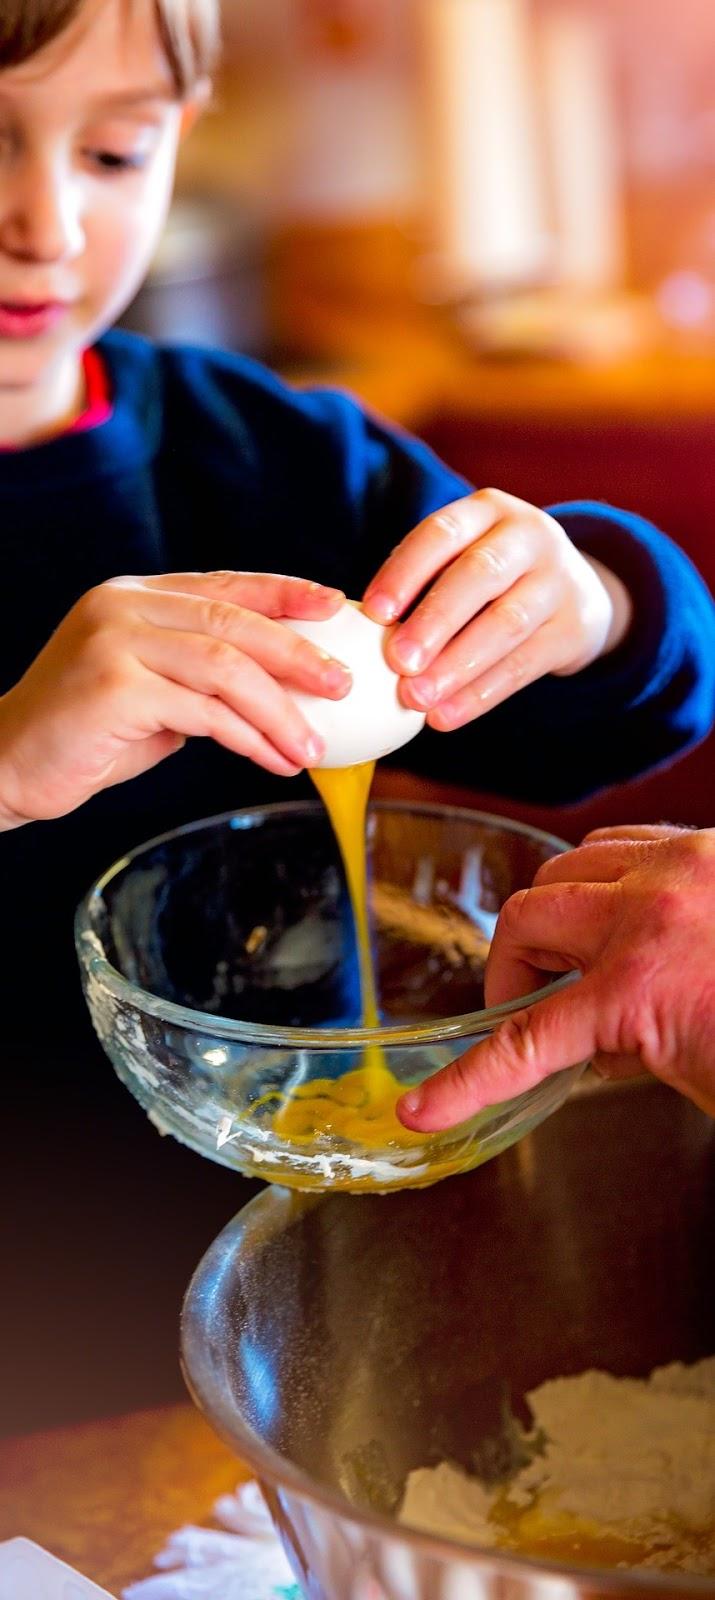 Teaching baking to a child.